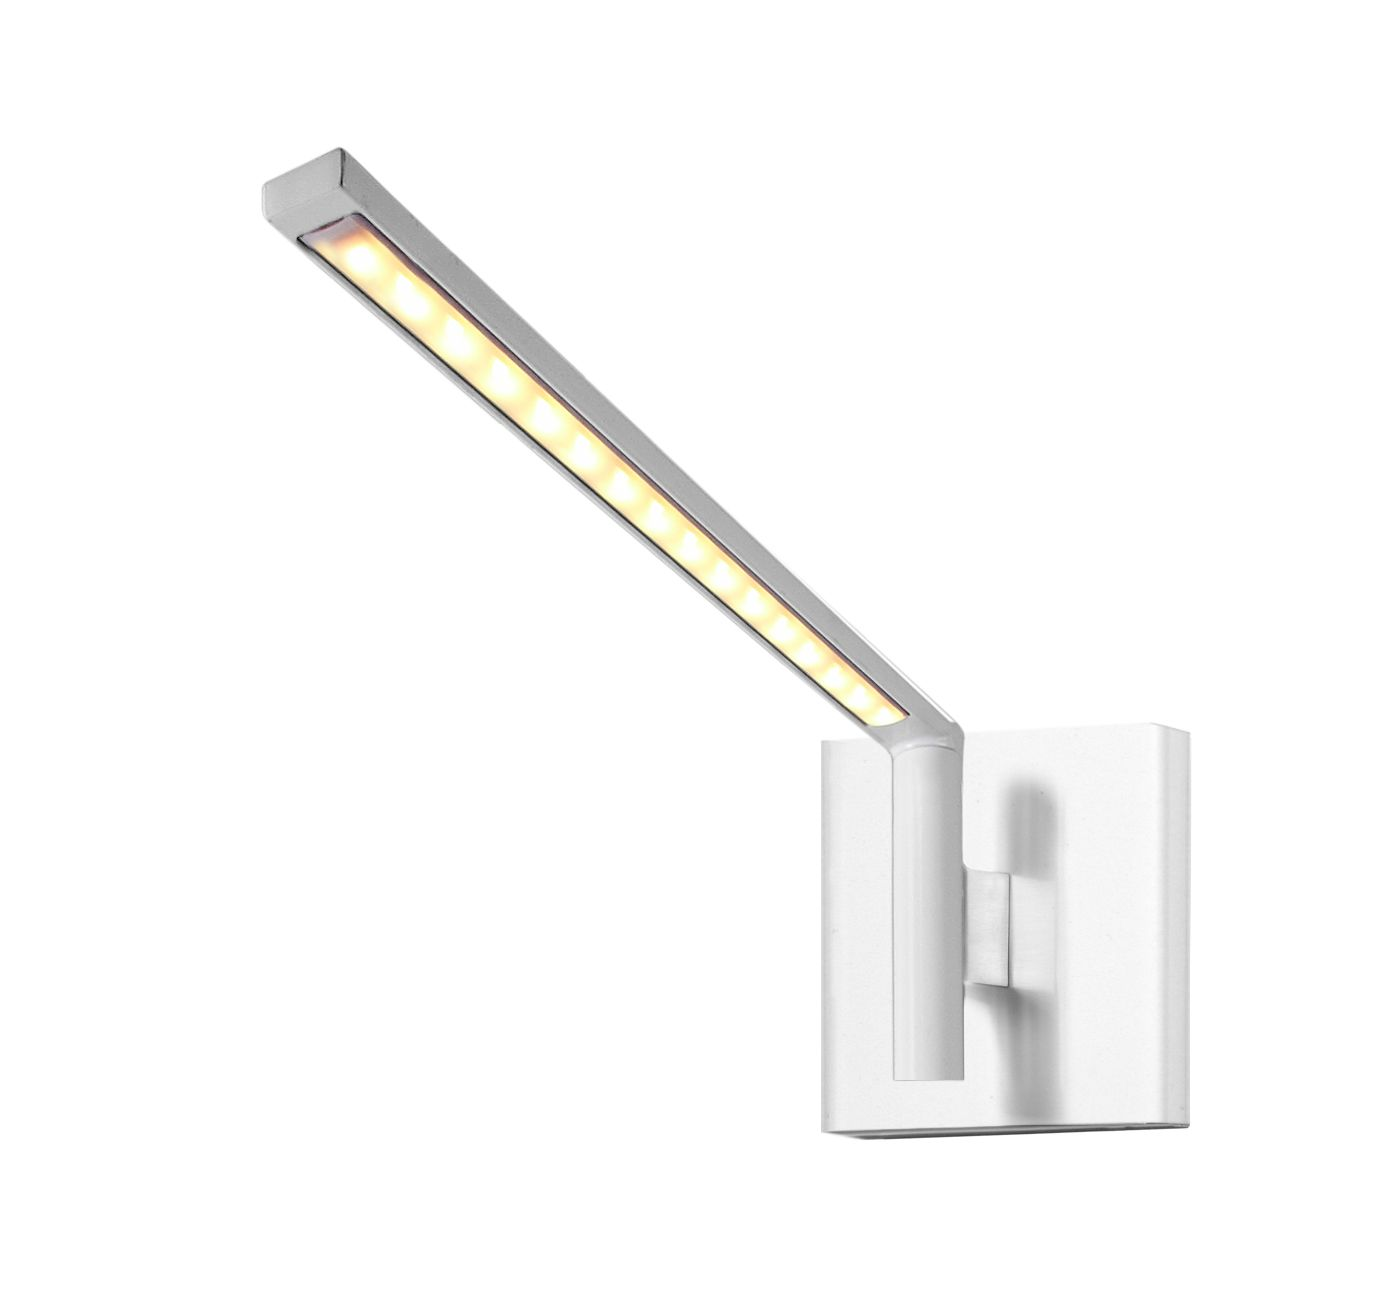 Matrix Led Lamp Led Strip 7w 12v White Height 12 Cm Length 41 Cm Matrix Led Lamp White Wall Luxcambra Walllamp Applique Apliqu Wall Lamp Lamp Decor